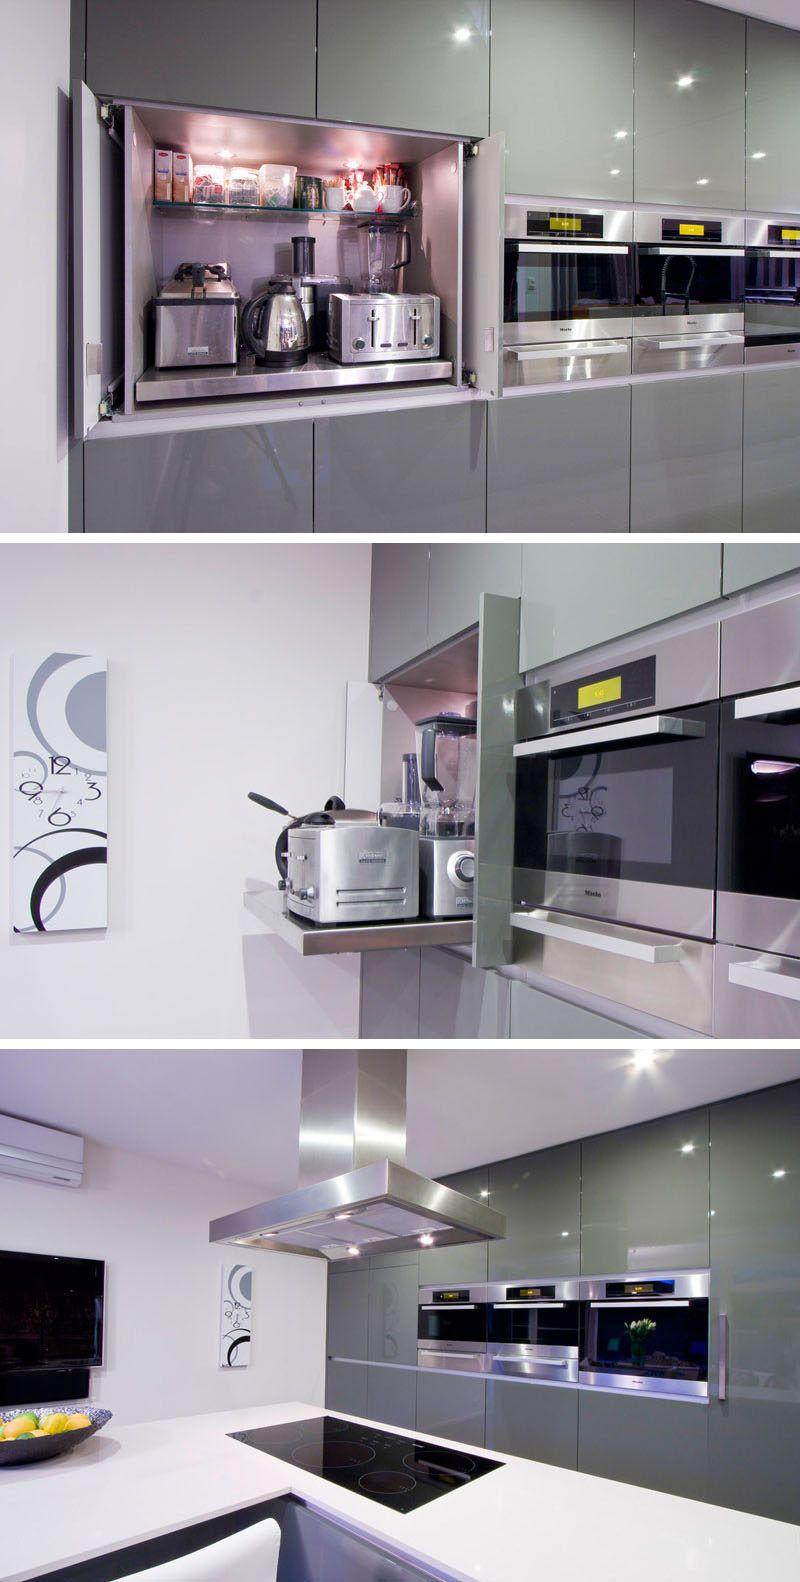 kitchen accessories design%0A Kitchen Design Idea  Store Your Kitchen Appliances In A Dedicated  Appliance Garage    The